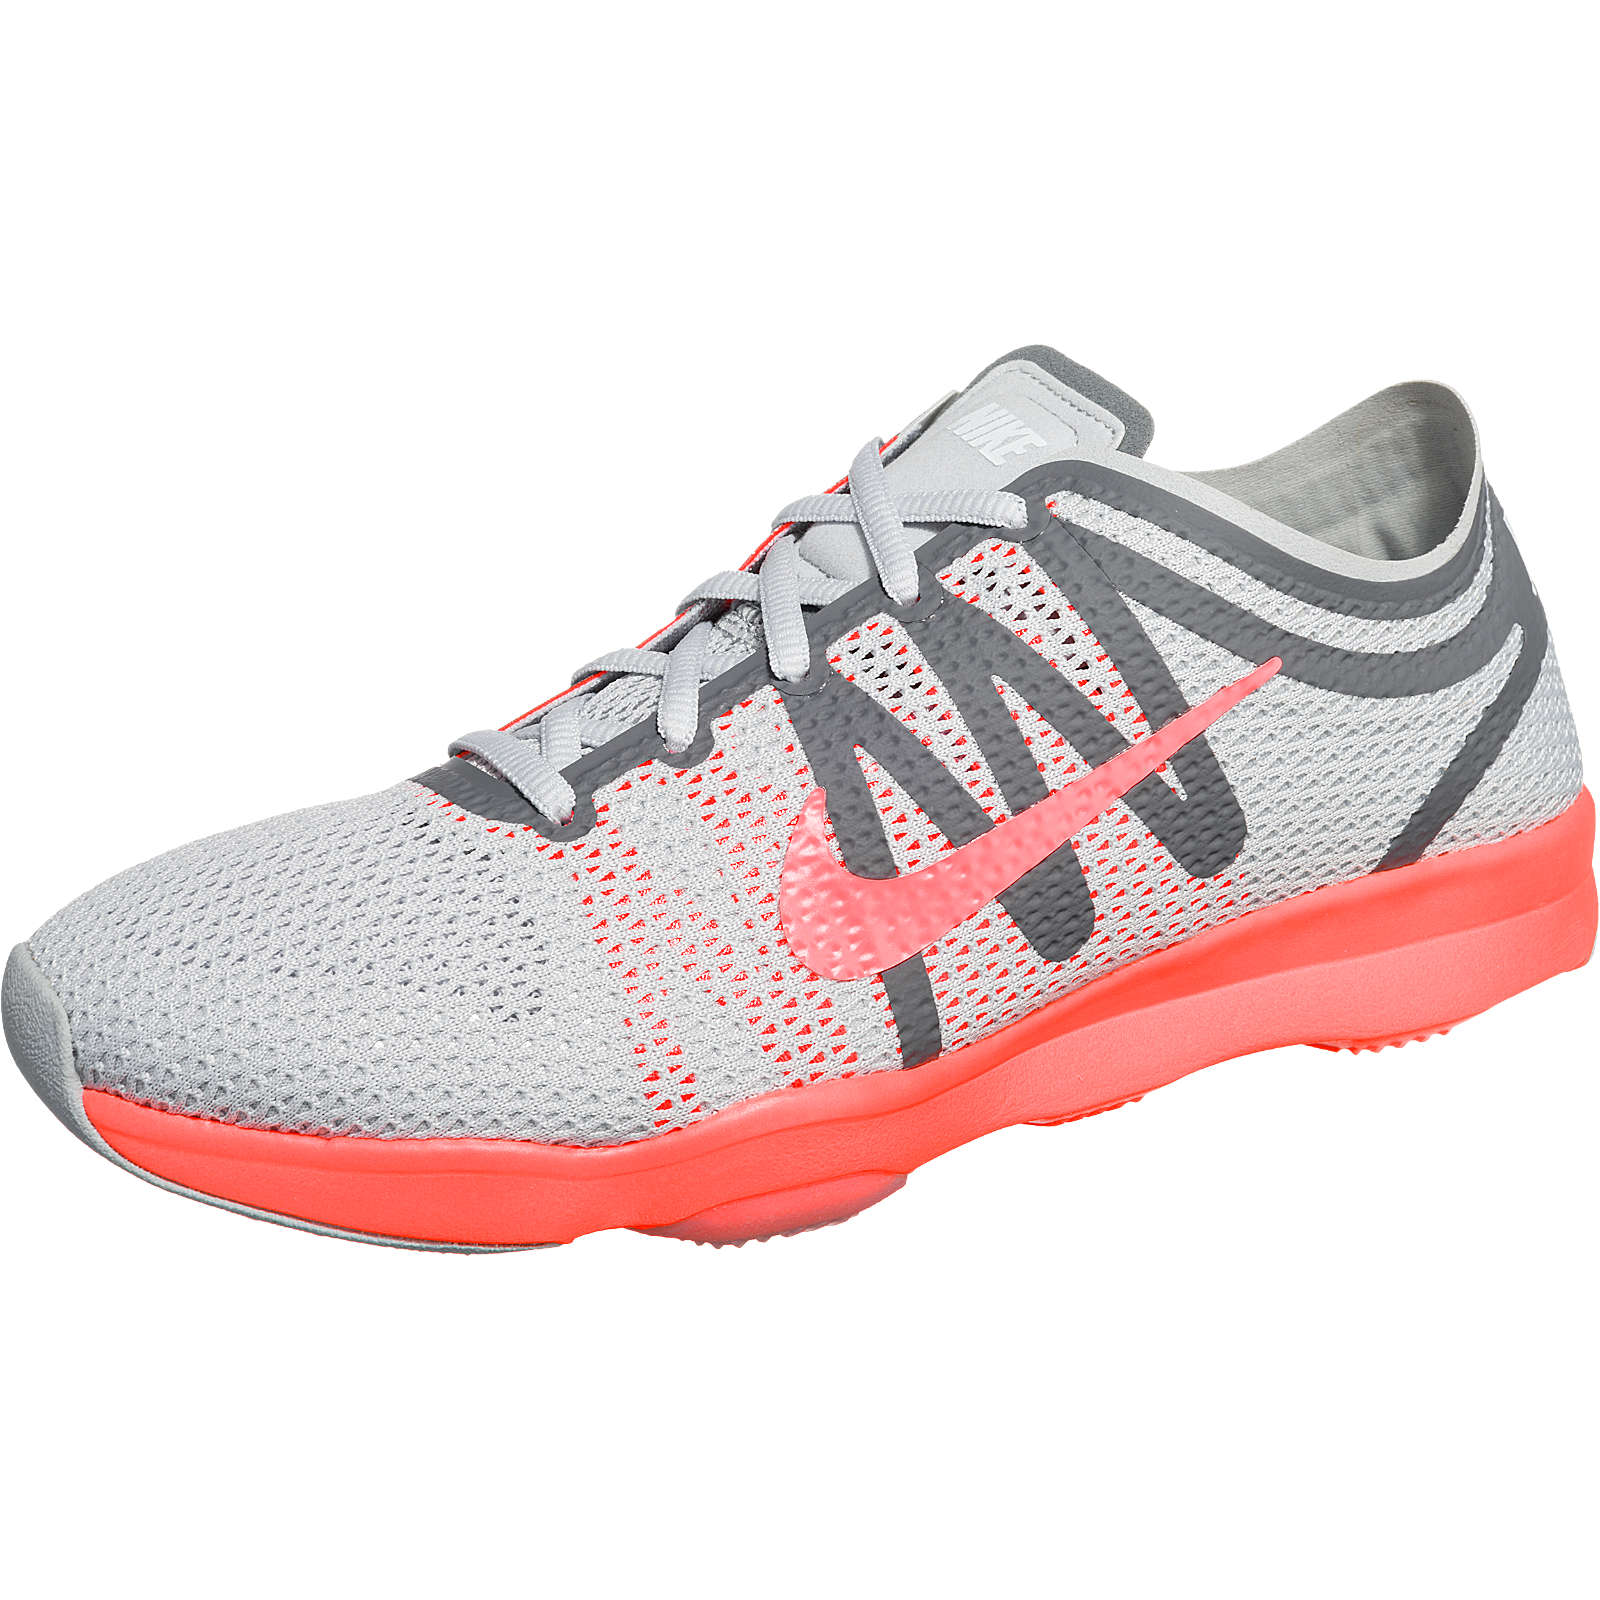 Nike Performance Air Zoom Fit 2 Sportschuhe grau-kombi Damen Gr. 38,5